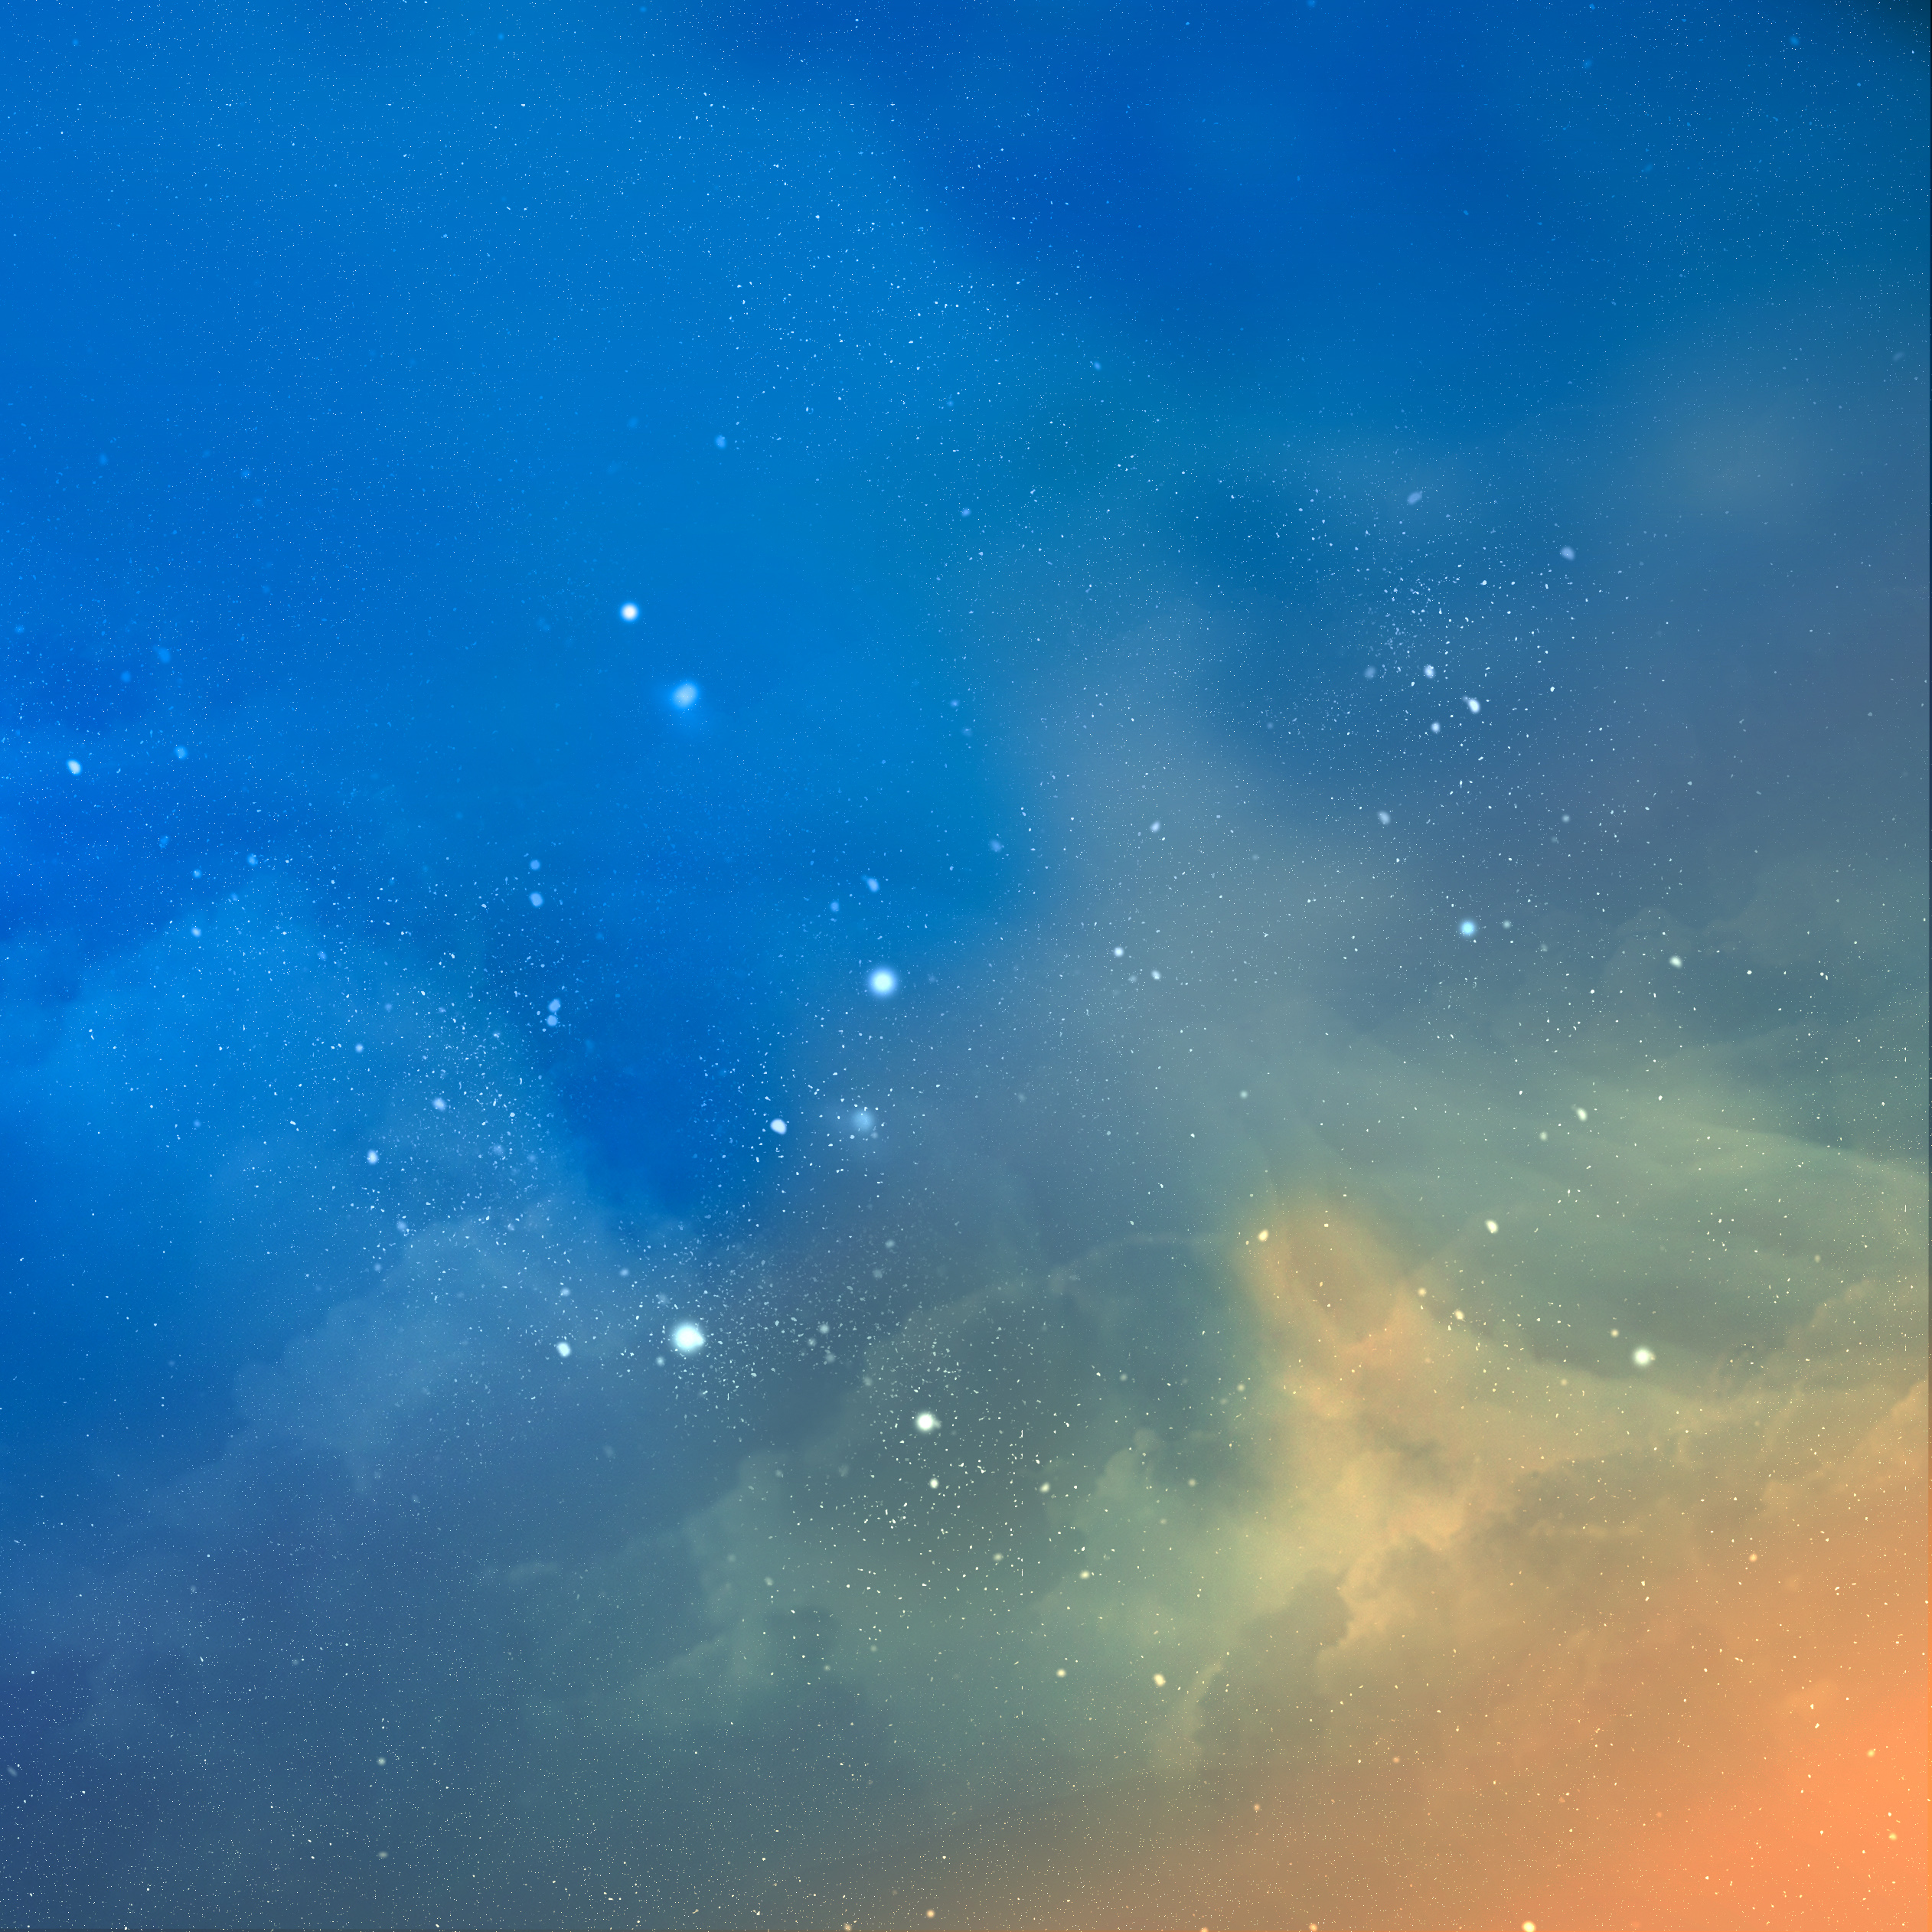 Simple Fall Hd Wallpaper Galaxy Wallpapers